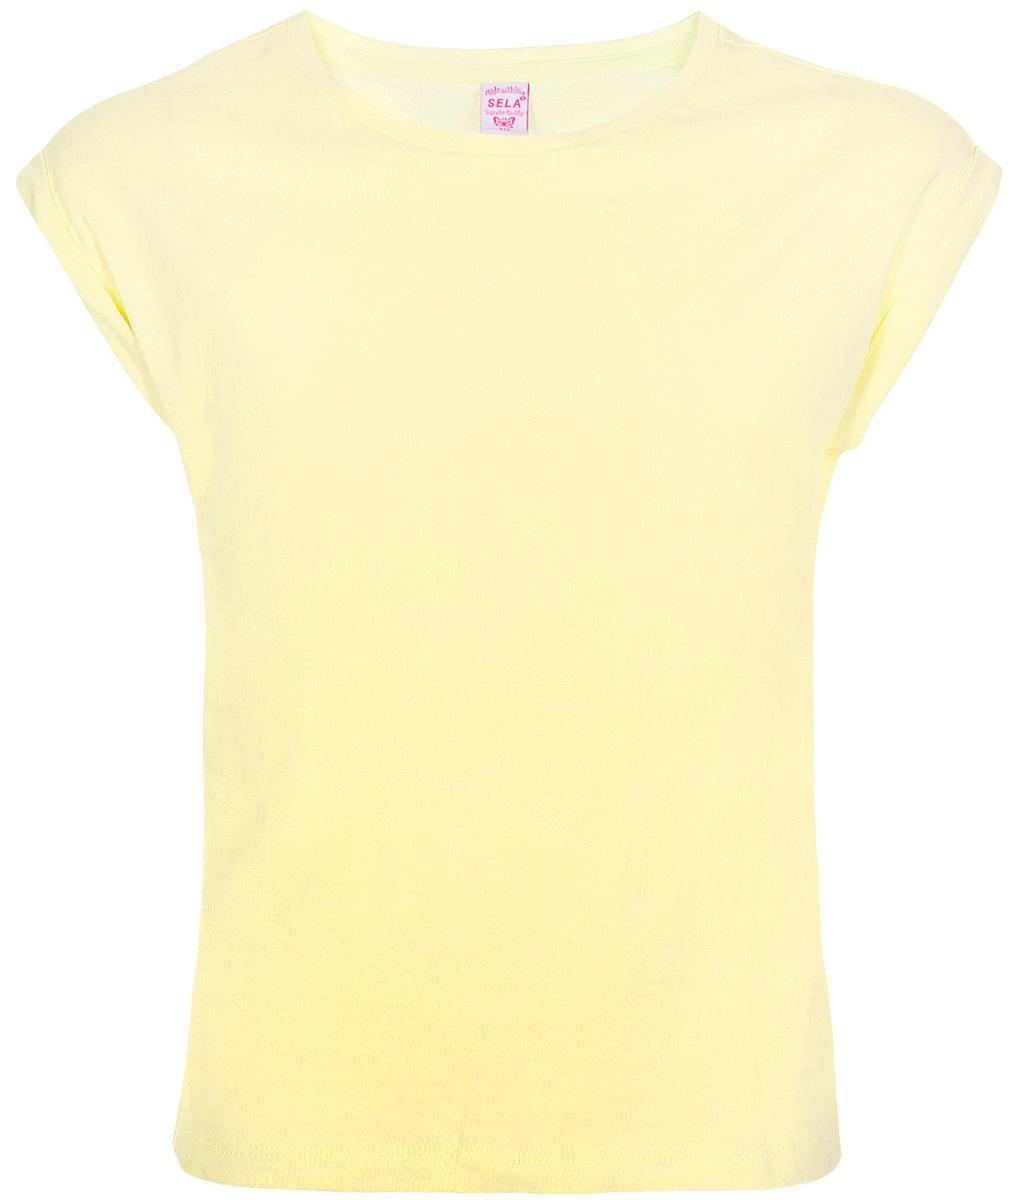 Футболка для девочки Sela, цвет: желтый. Ts-611/1261-8223. Размер 152 цена